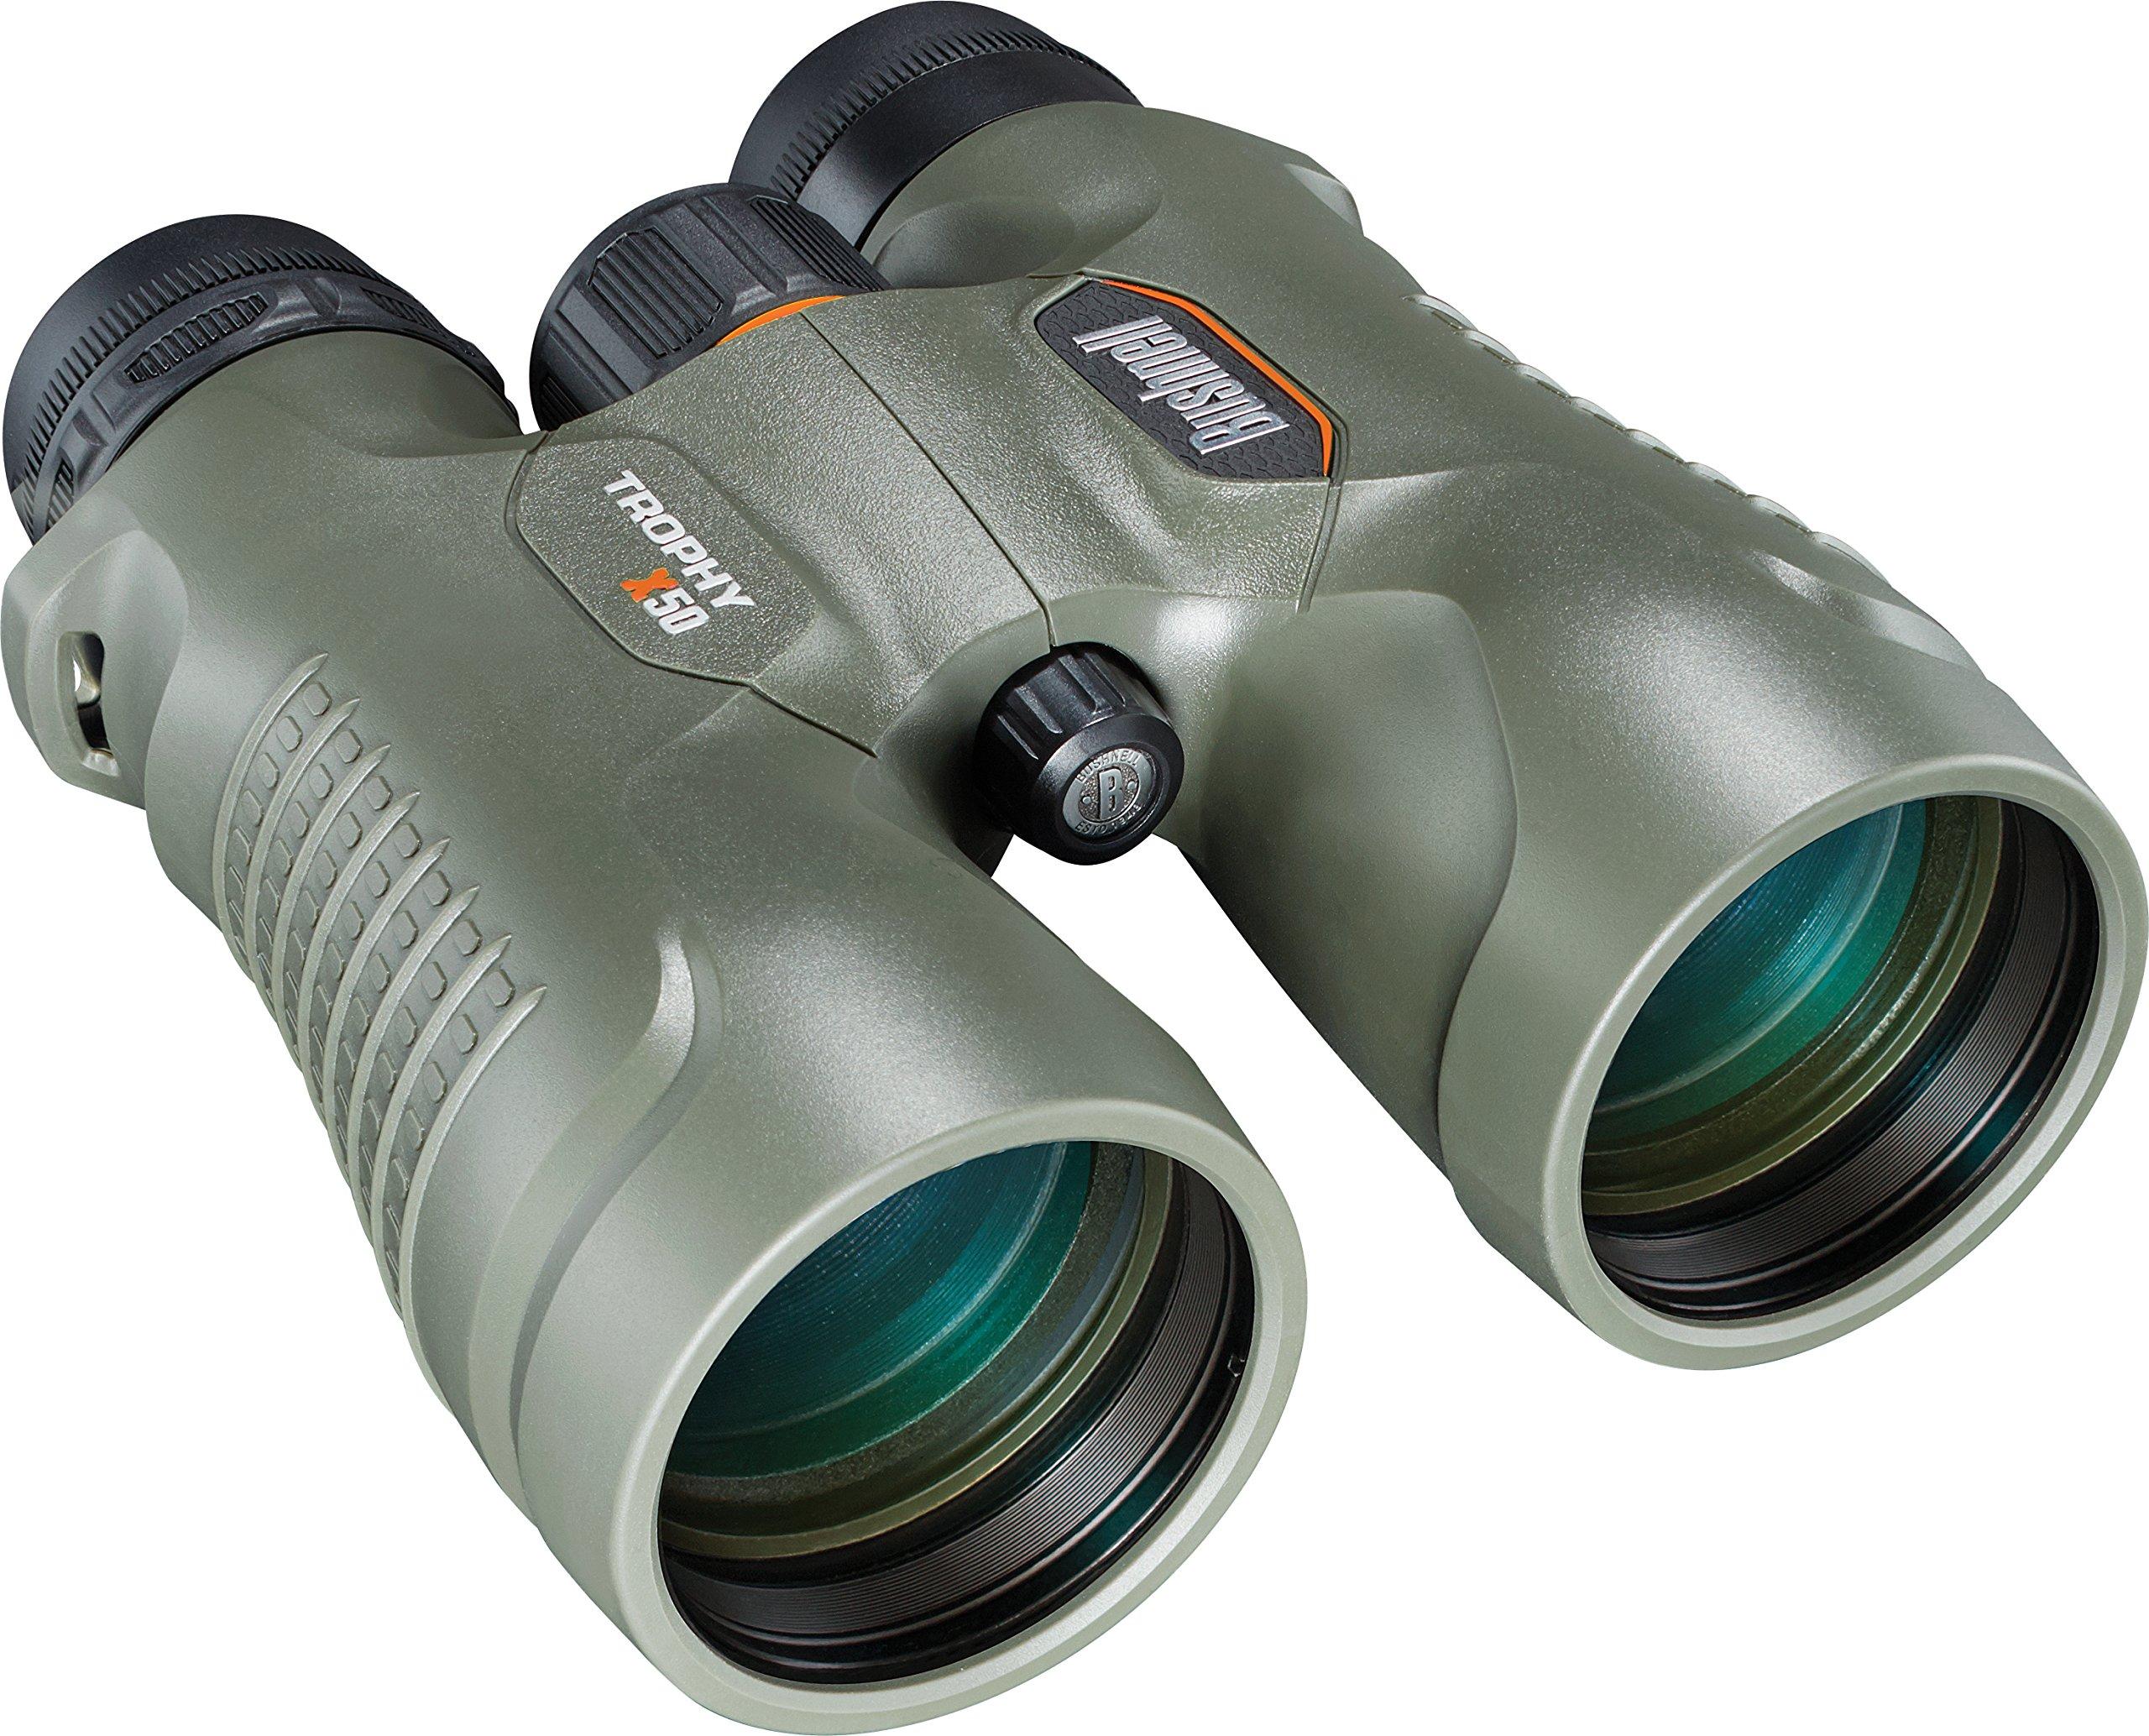 Bushnell Trophy Xtreme Binocular, Green, 8 x 56mm by Bushnell